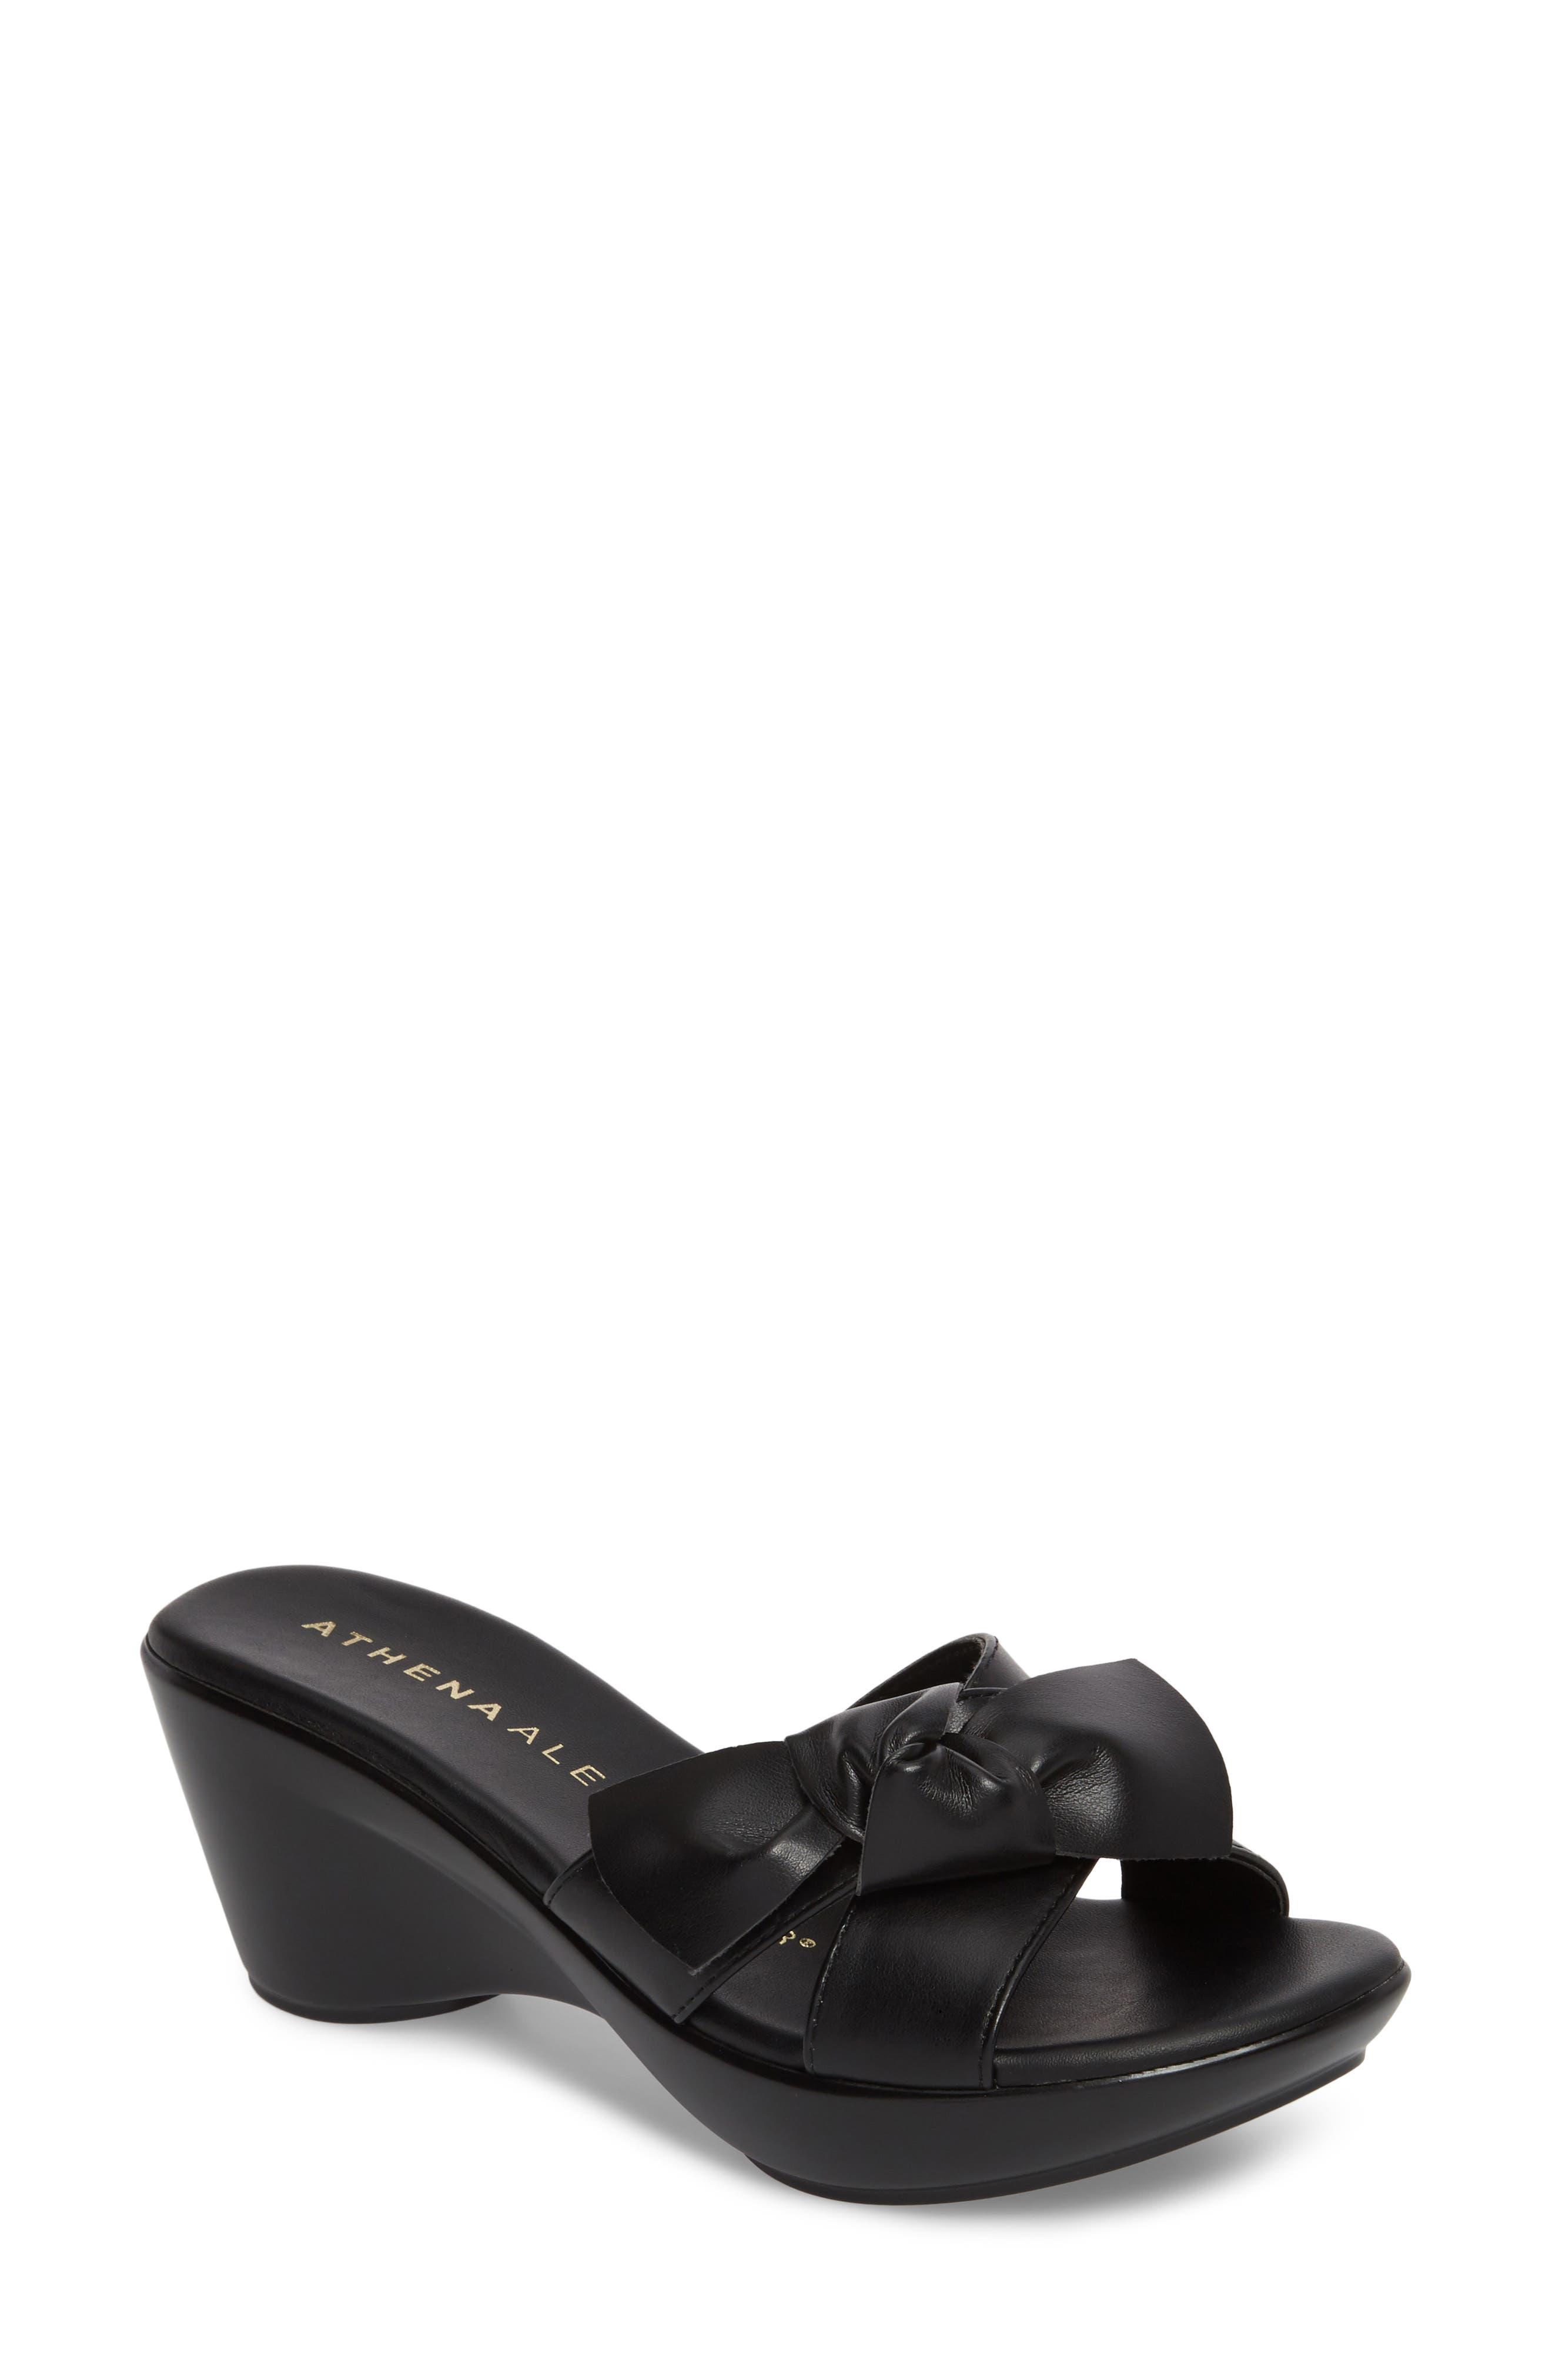 Giada Wedge Sandal,                             Main thumbnail 1, color,                             Black Fabric